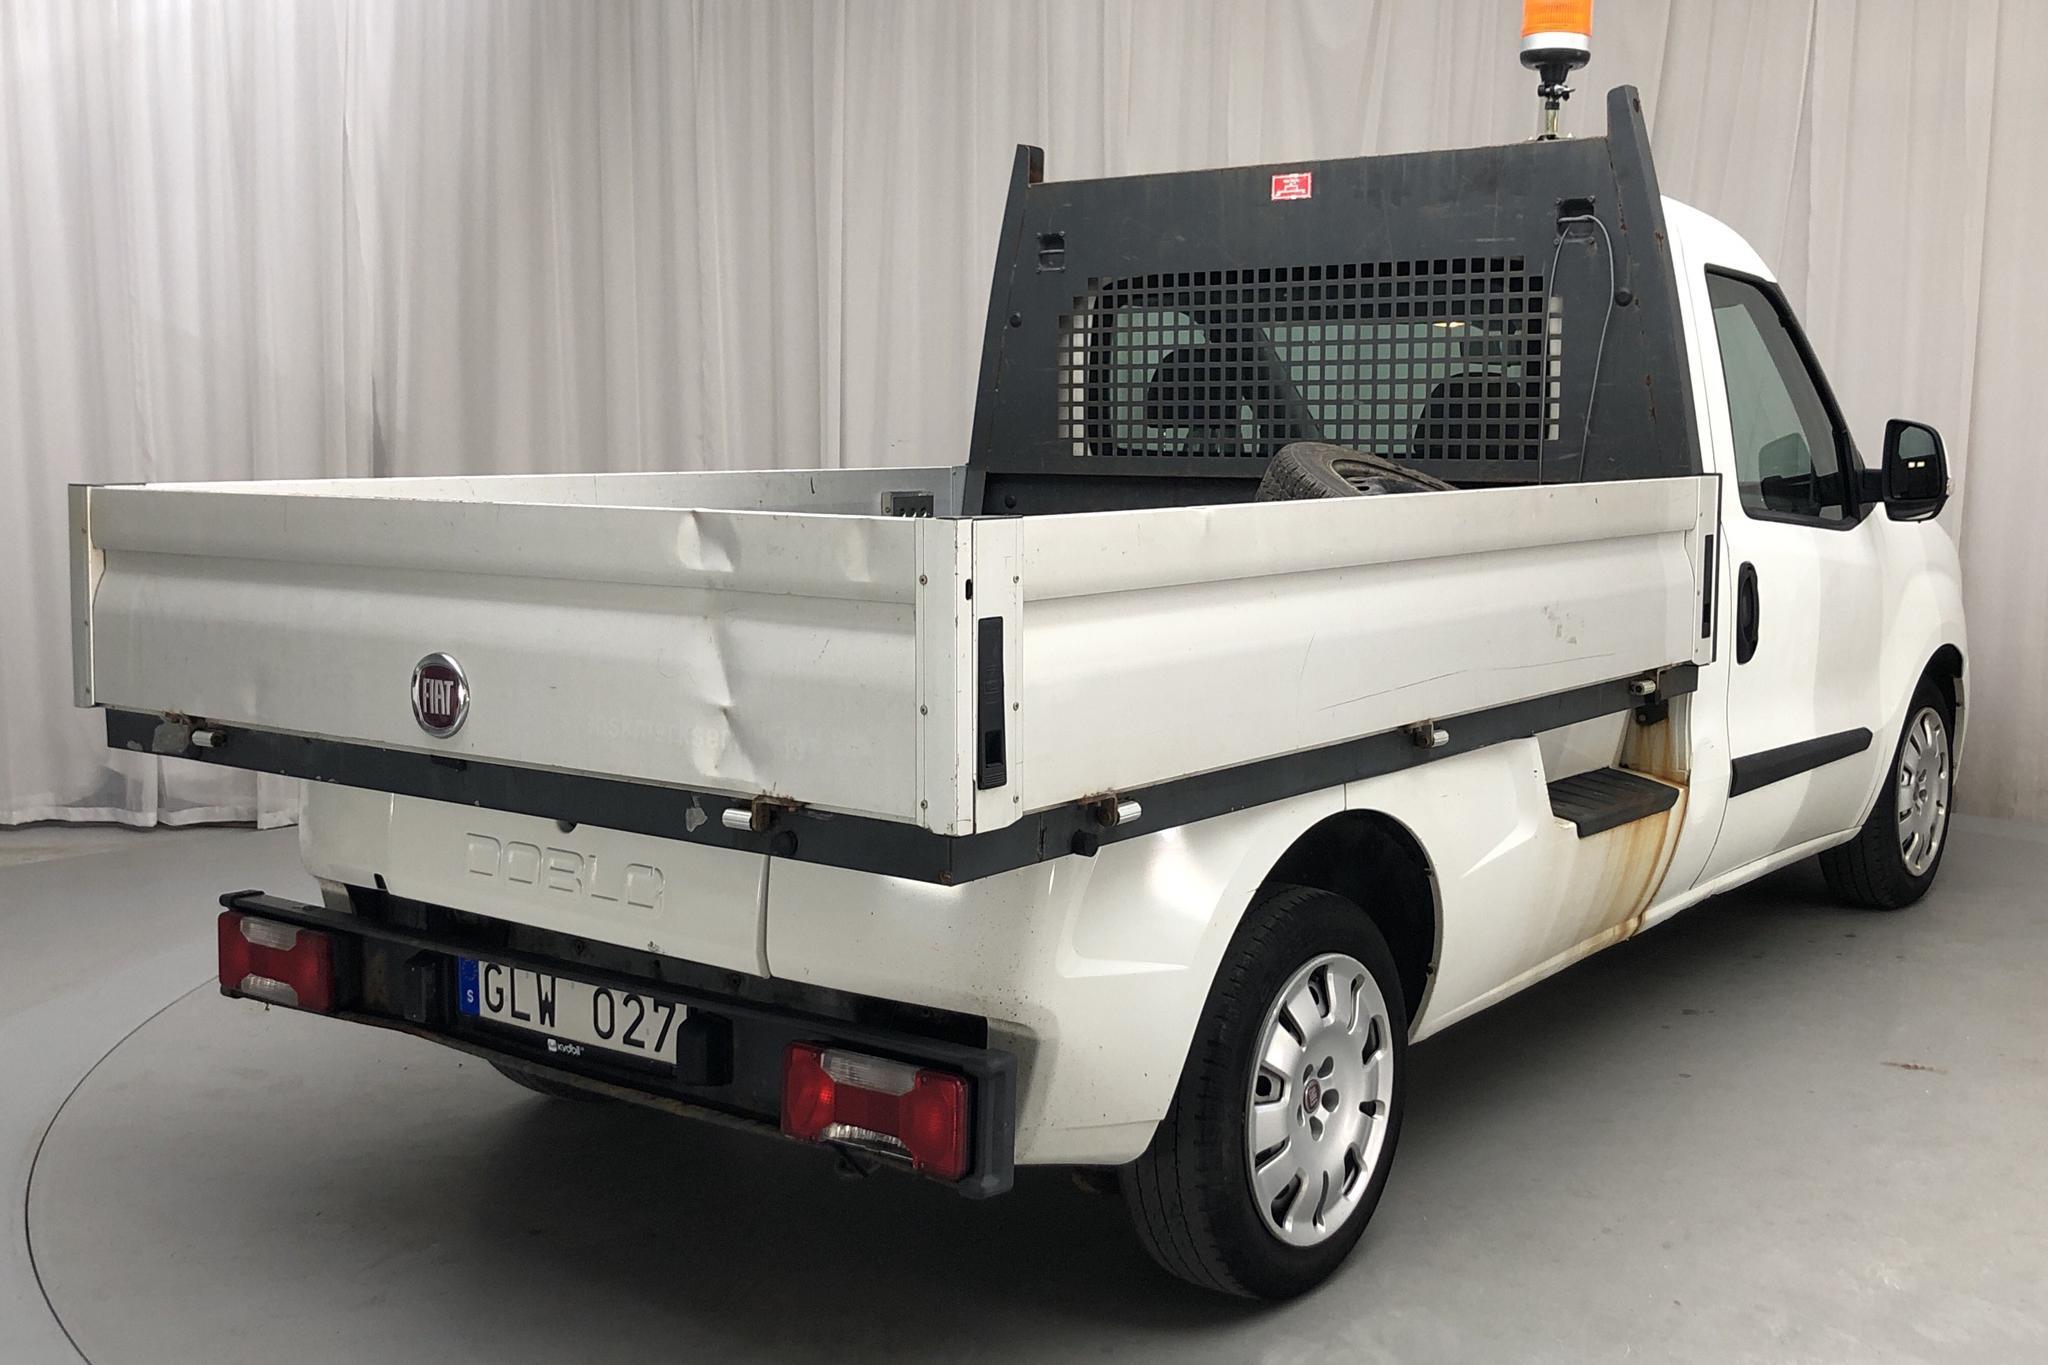 Fiat Doblo Work Up 1.3 Multijet (90hk) - 132 510 km - Manual - white - 2012